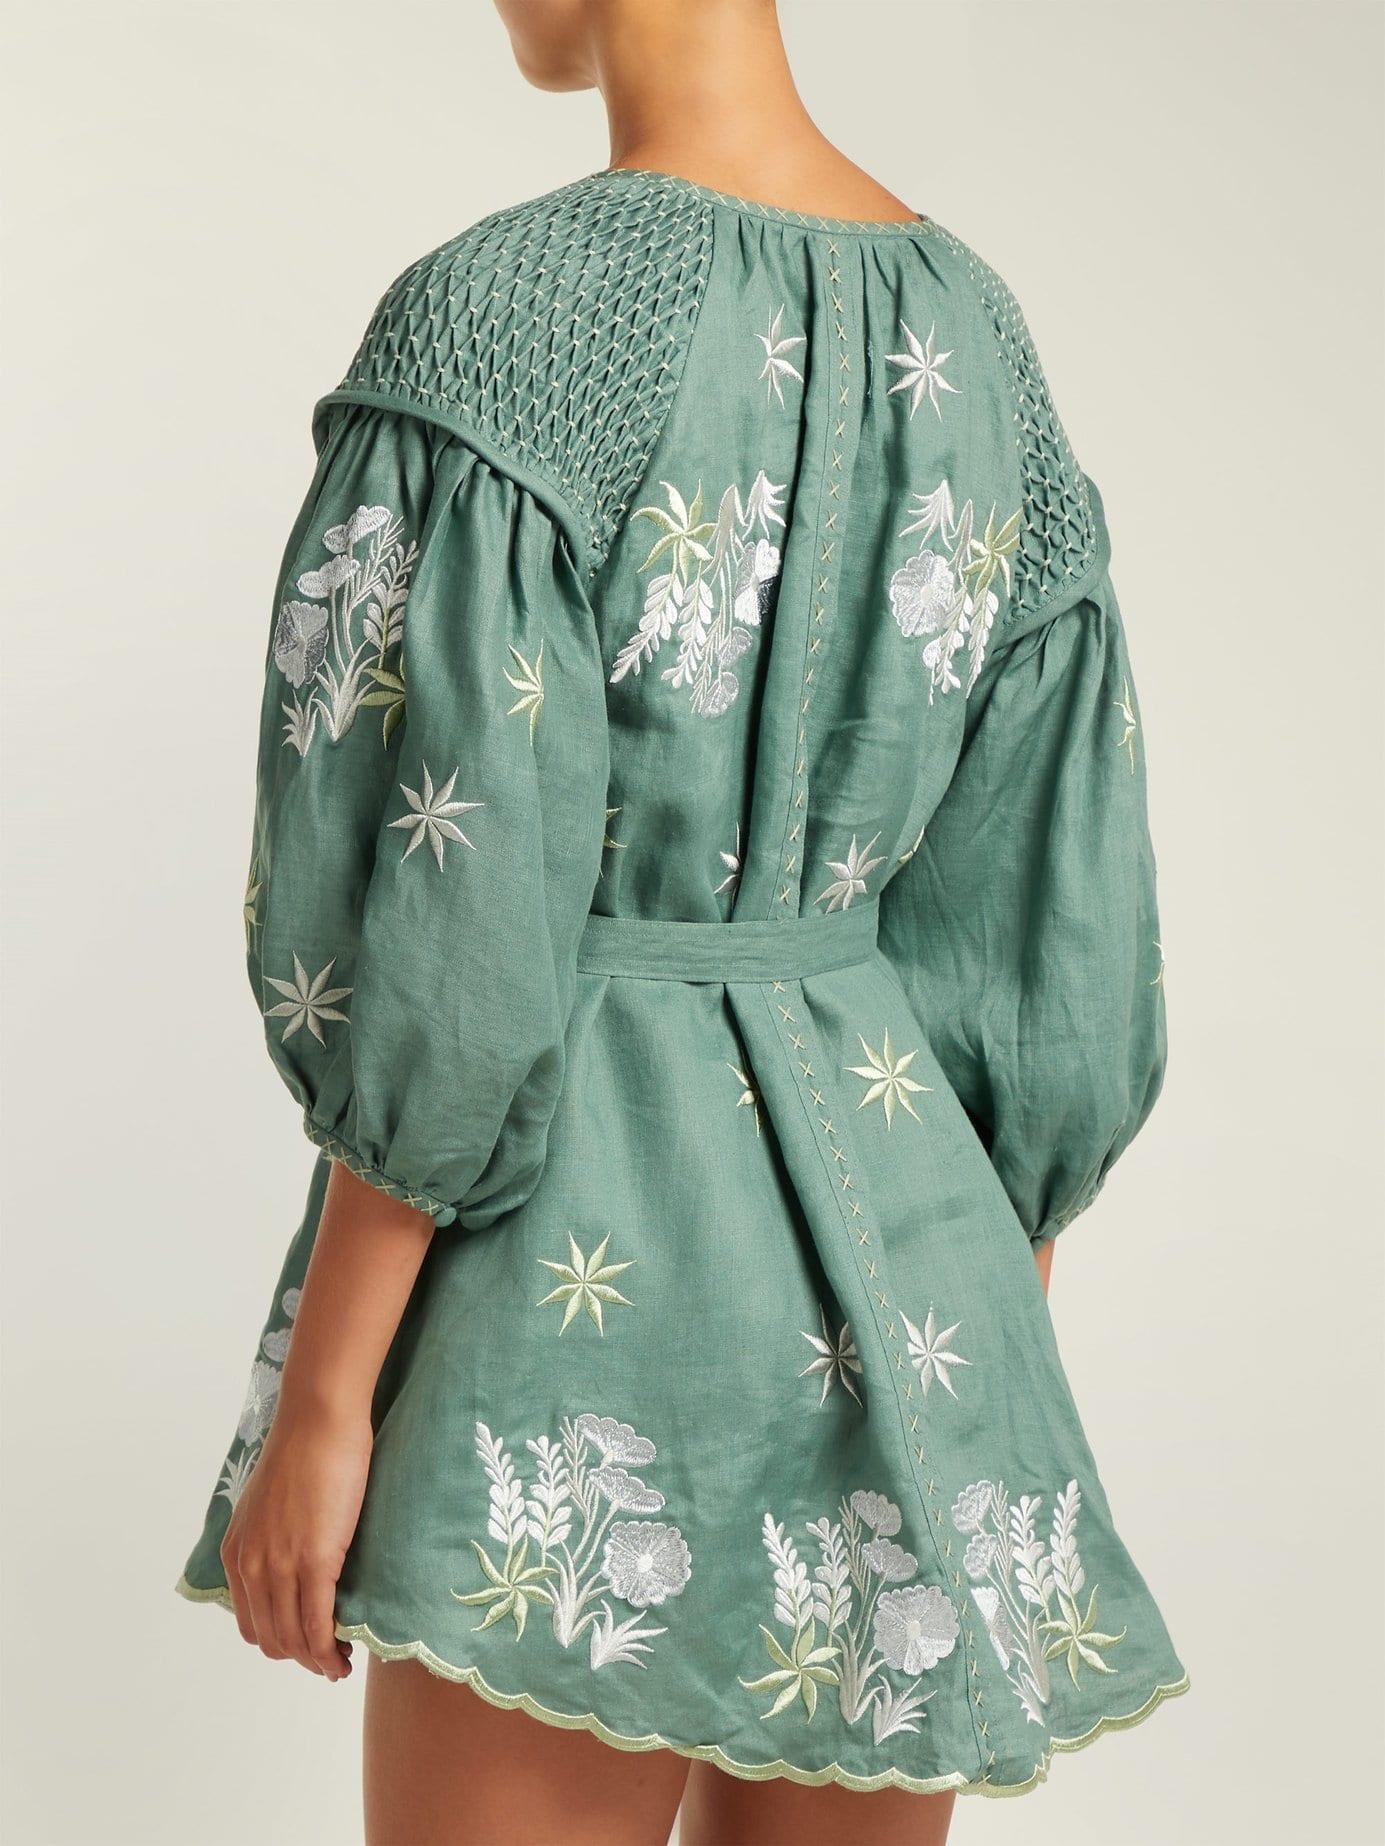 4bde45fd52d INNIKA CHOO Embroidered Linen Smock Green Dress - We Select Dresses